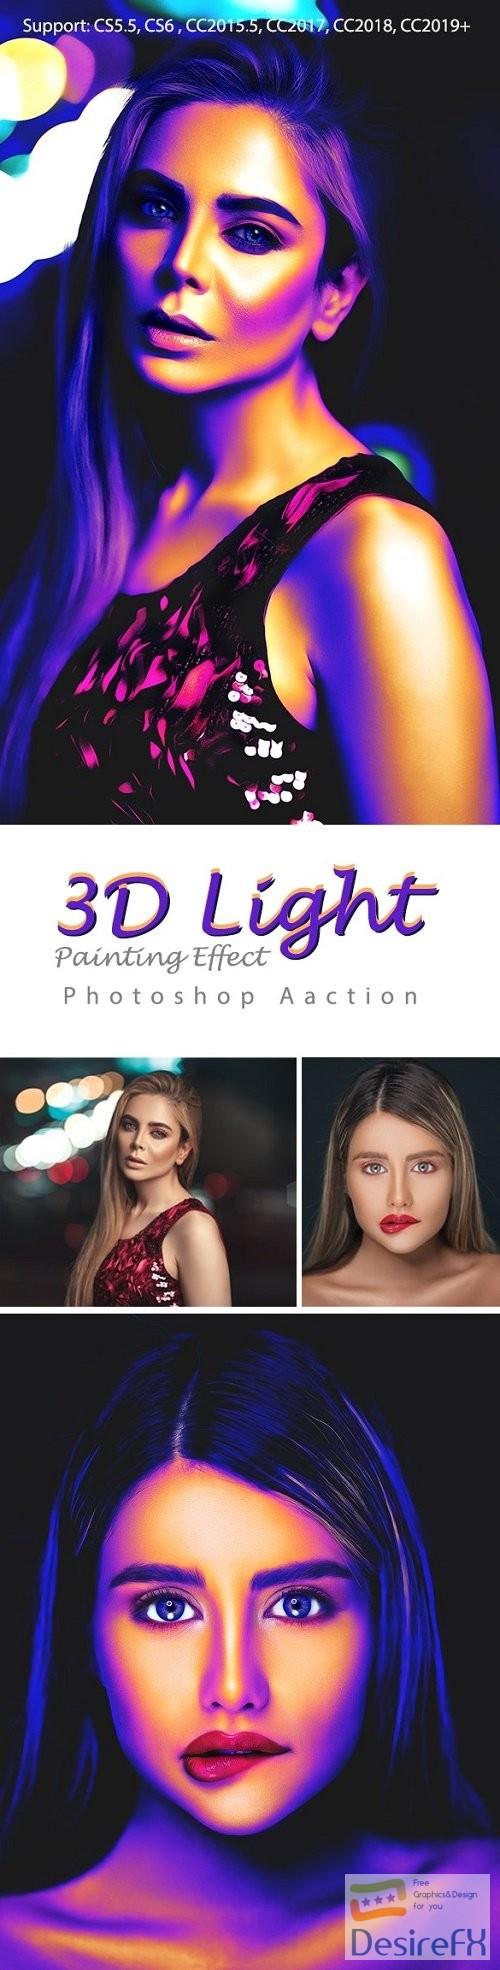 3D Light Painting Effect 23989388